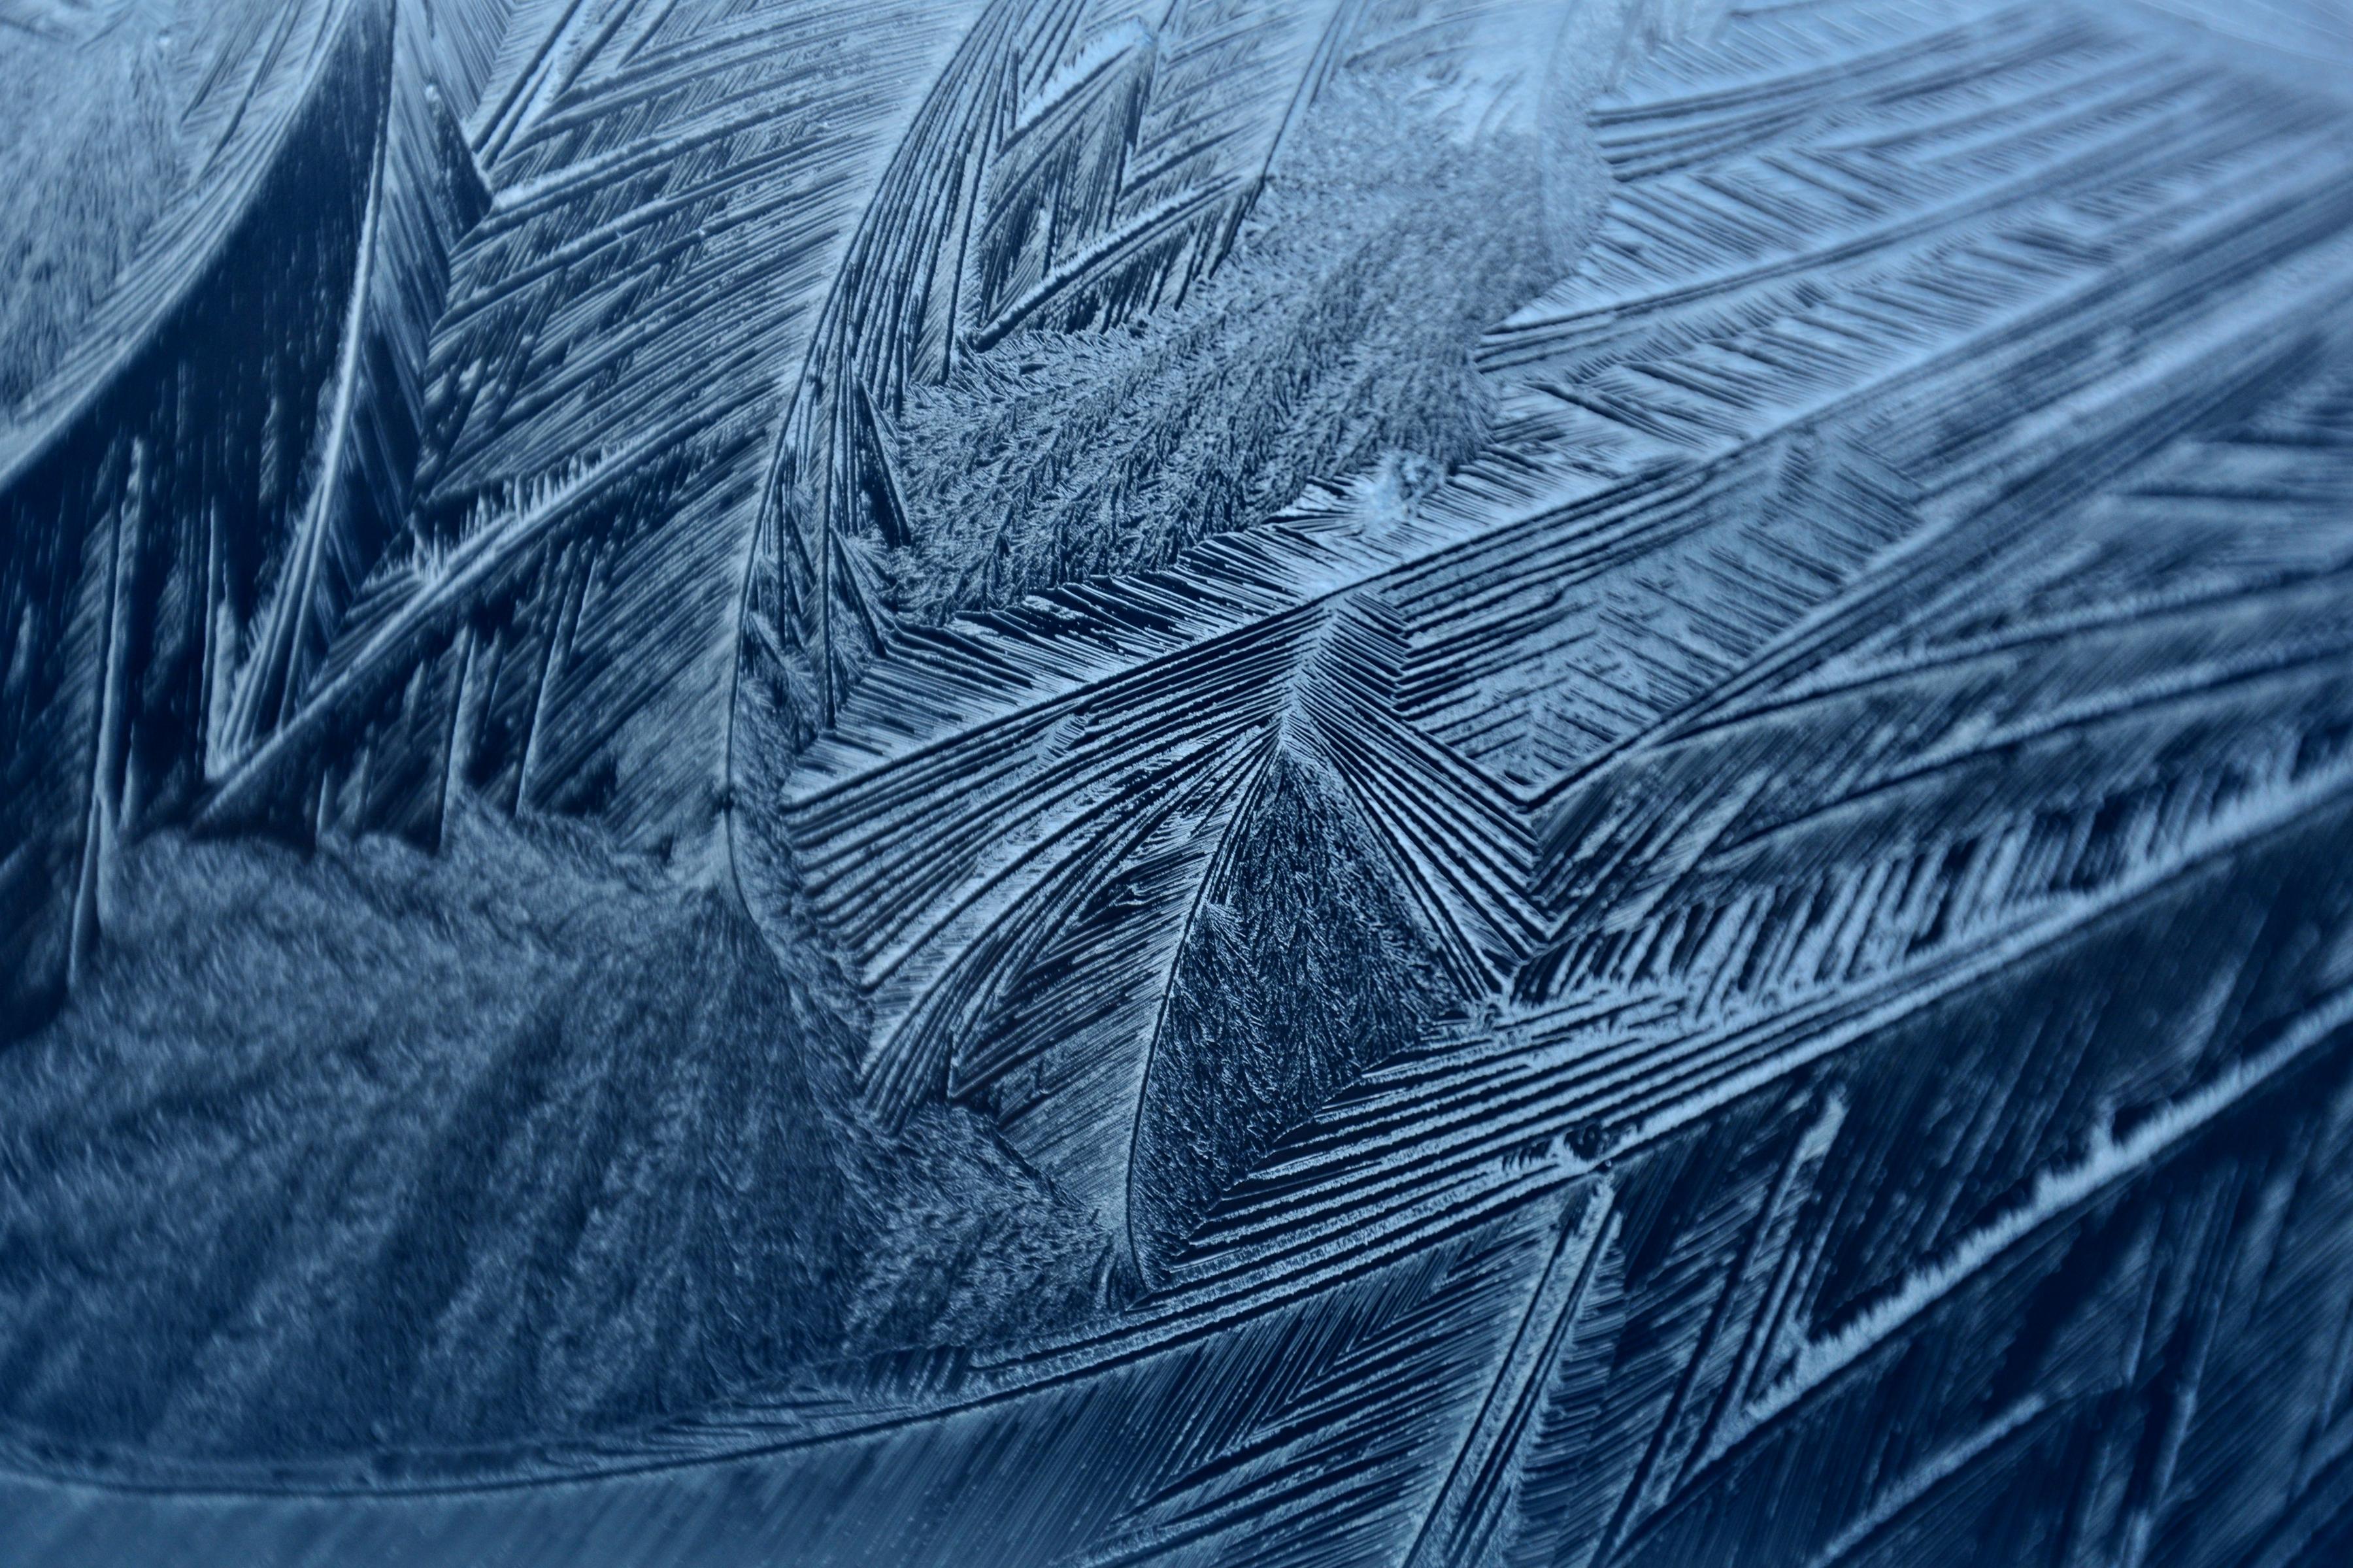 M0112 Frostfedern.jpg